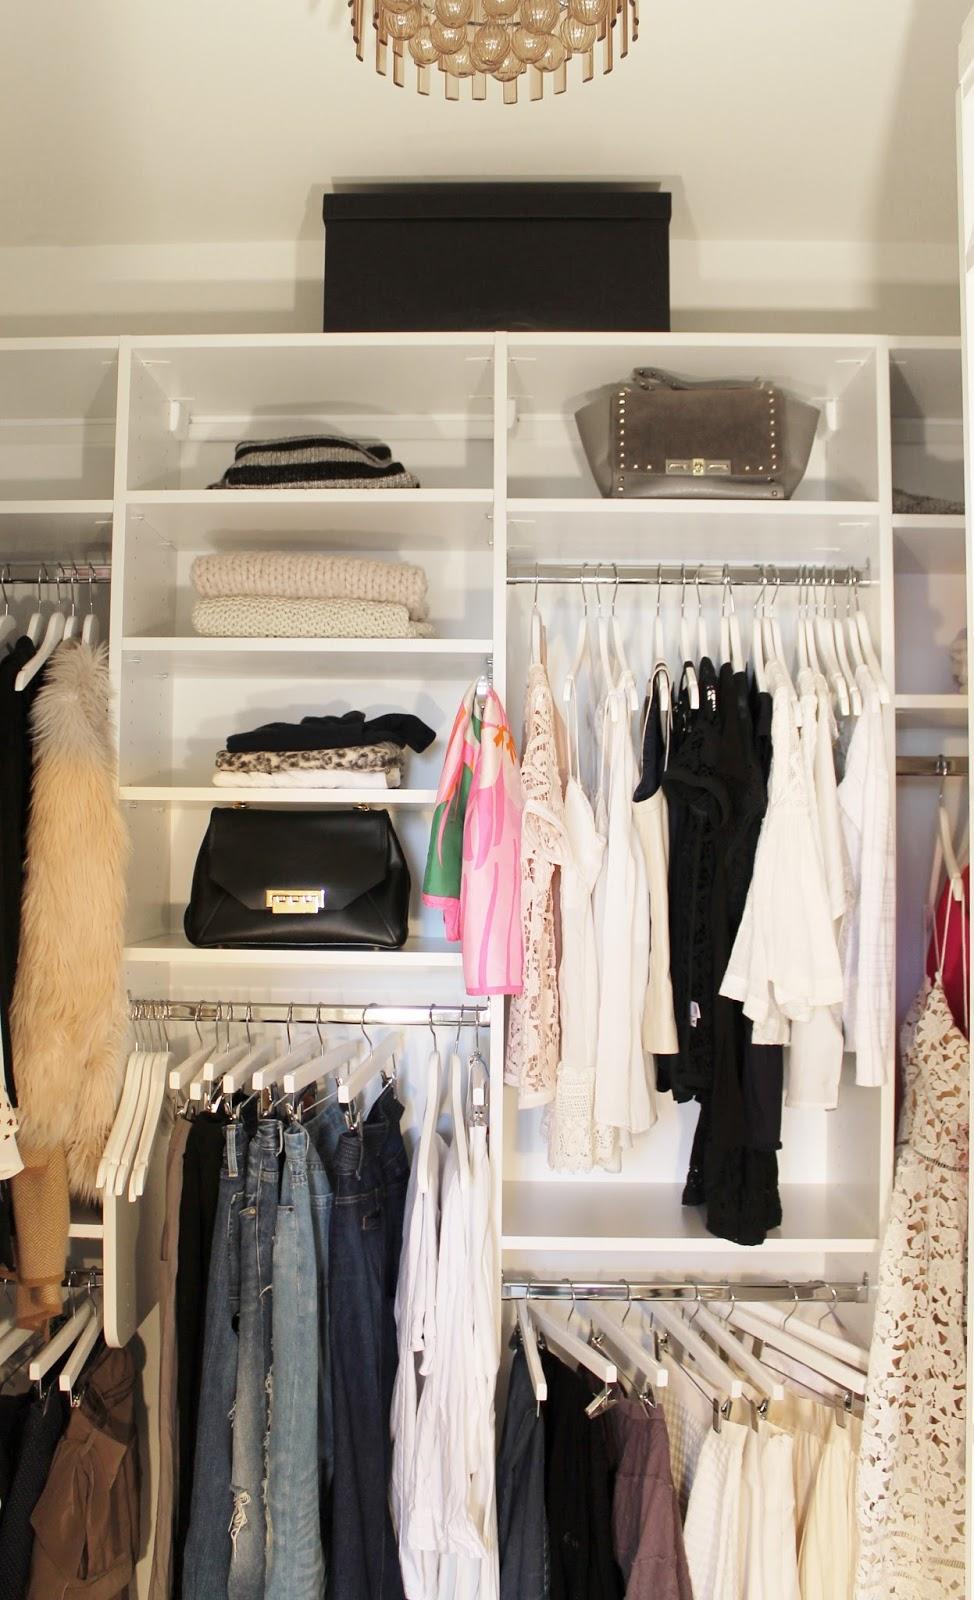 DUVALs Tips For An Organized Closet